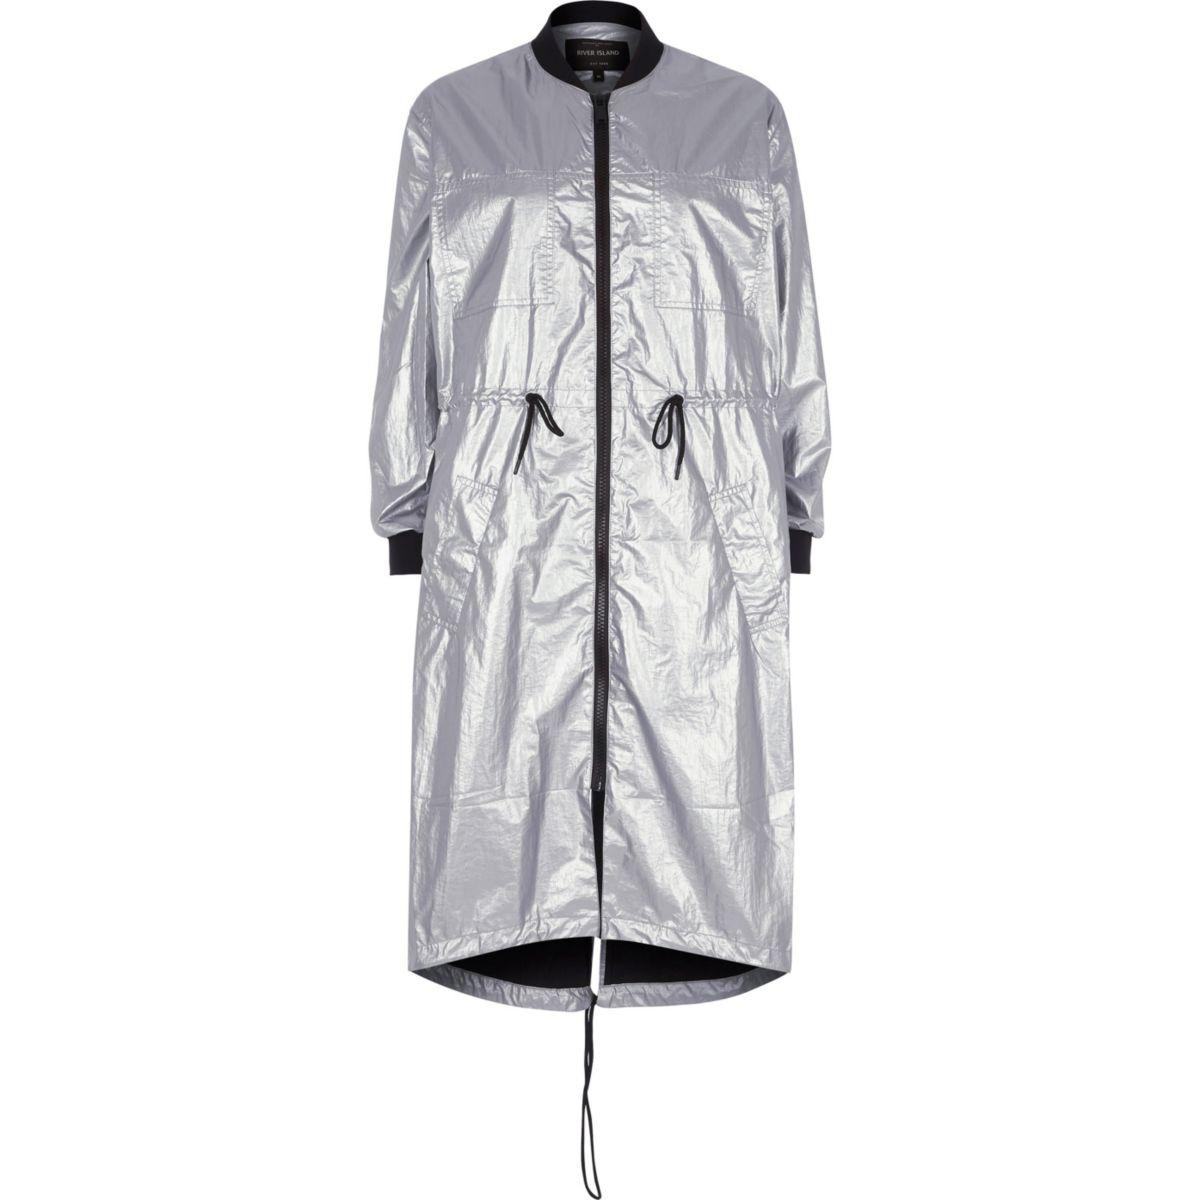 Silver metallic longline anorak jacket